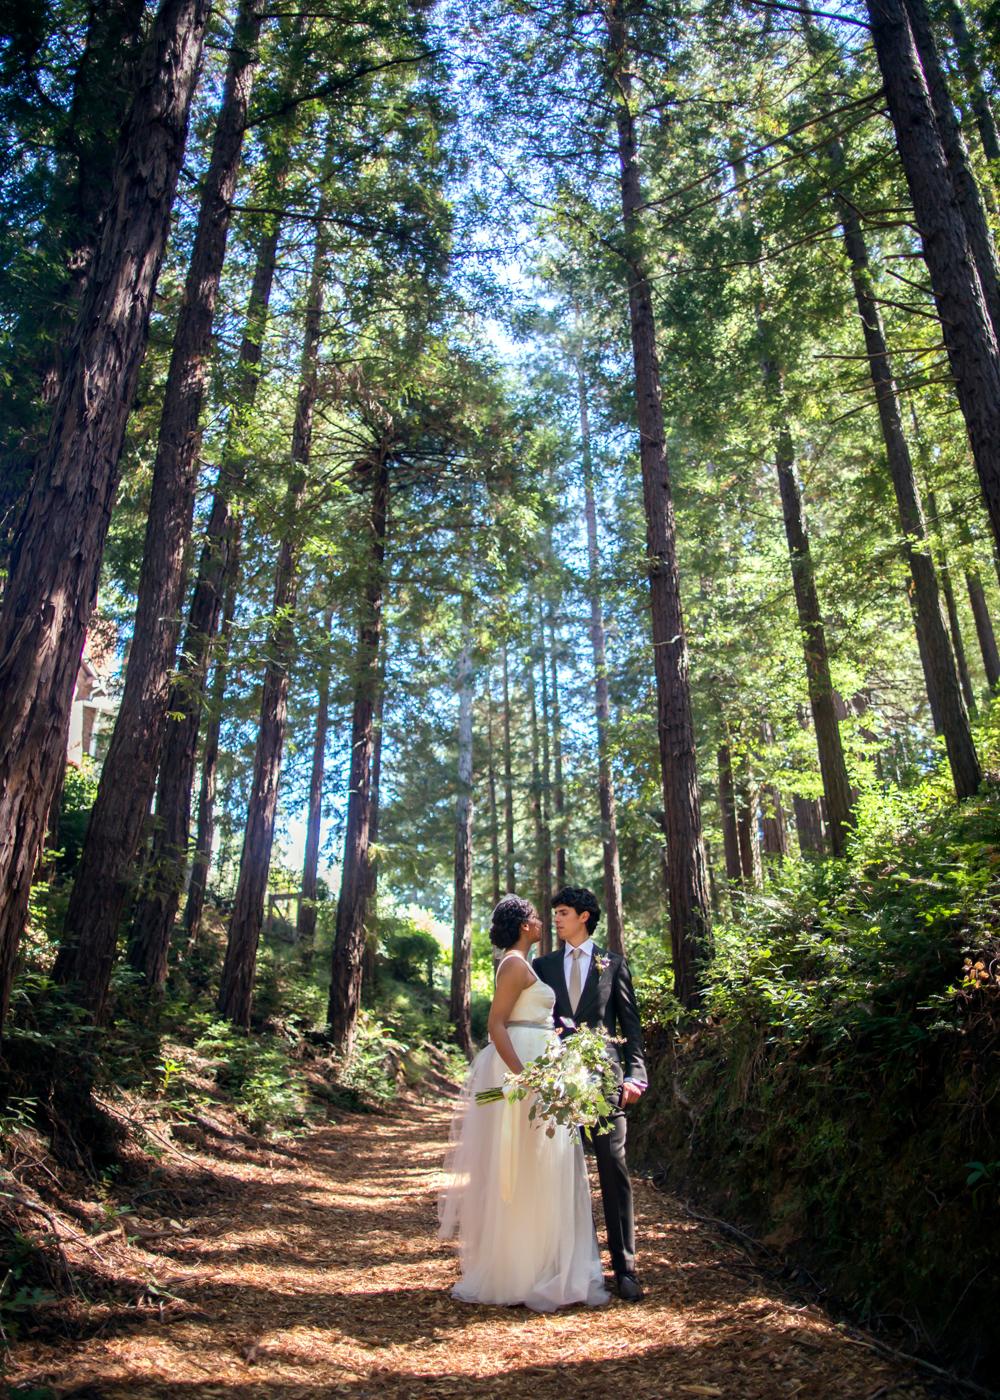 ralston-white-retreat-mill-valley-wedding-photography-lilouette-30.jpg